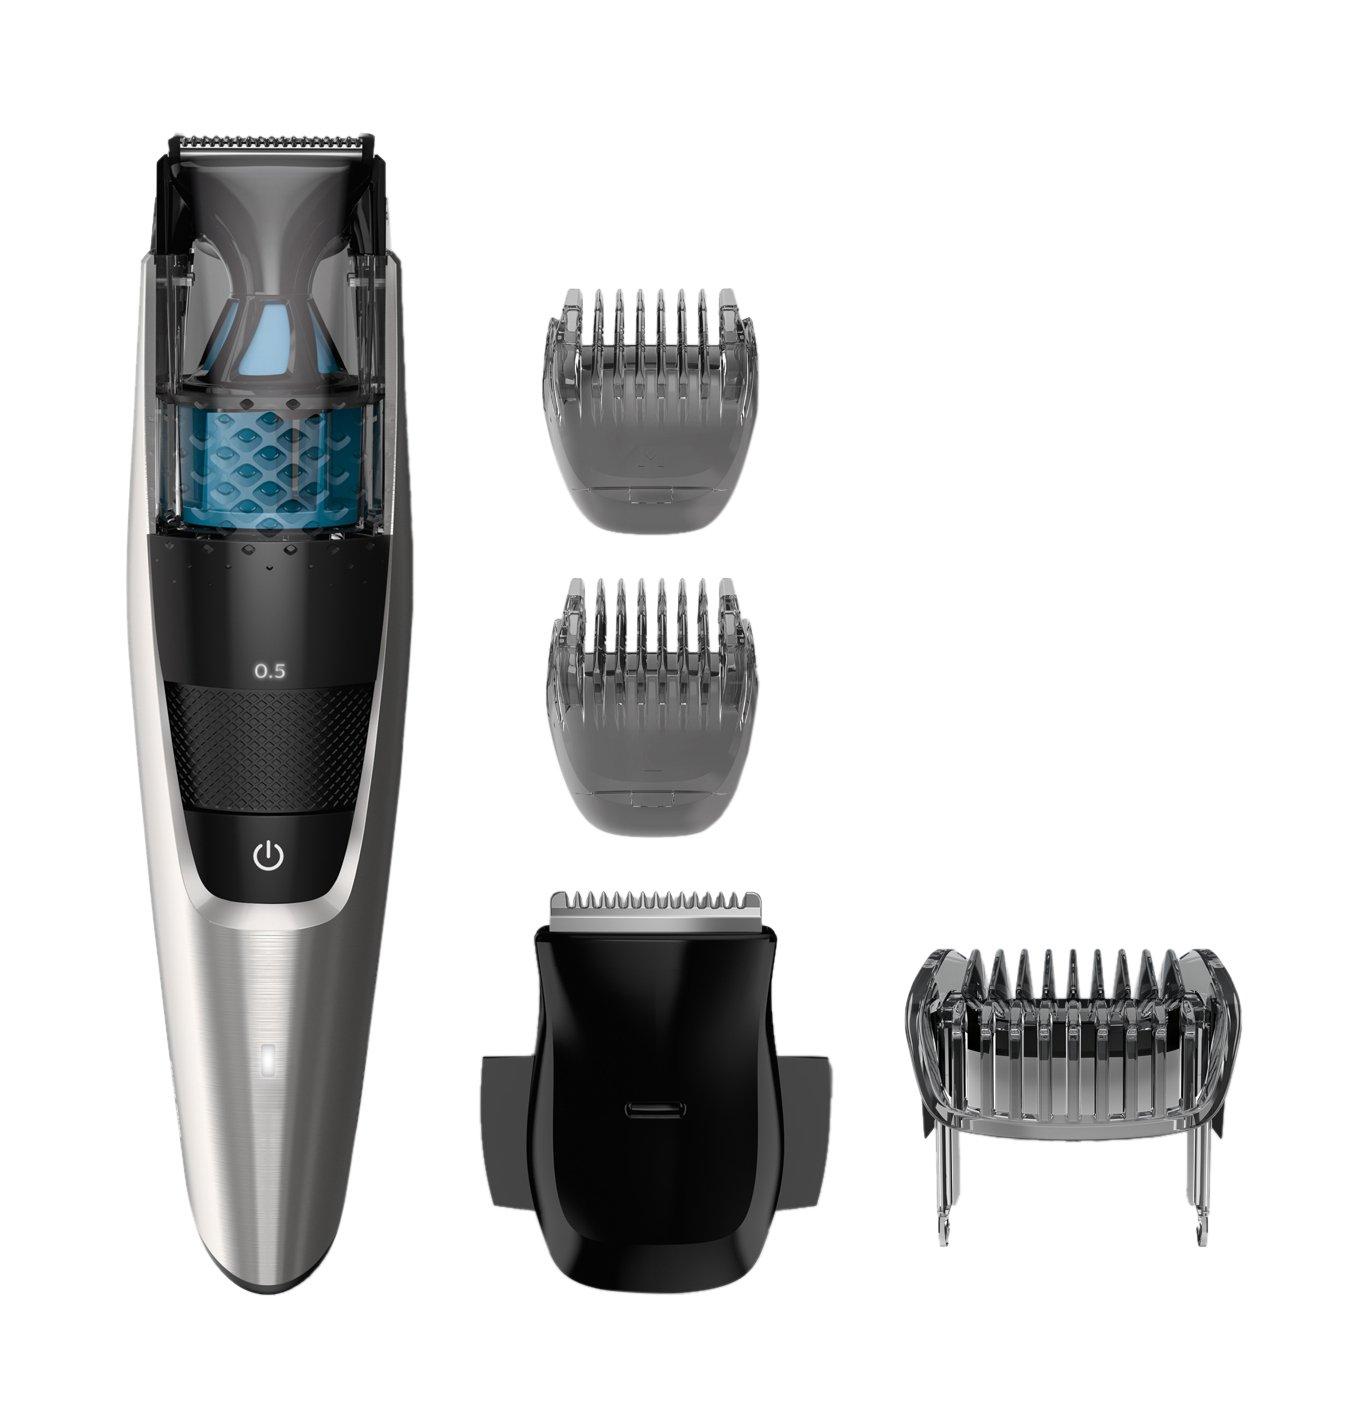 Philips Norelco 7200 Vacuum Beard Trimmer